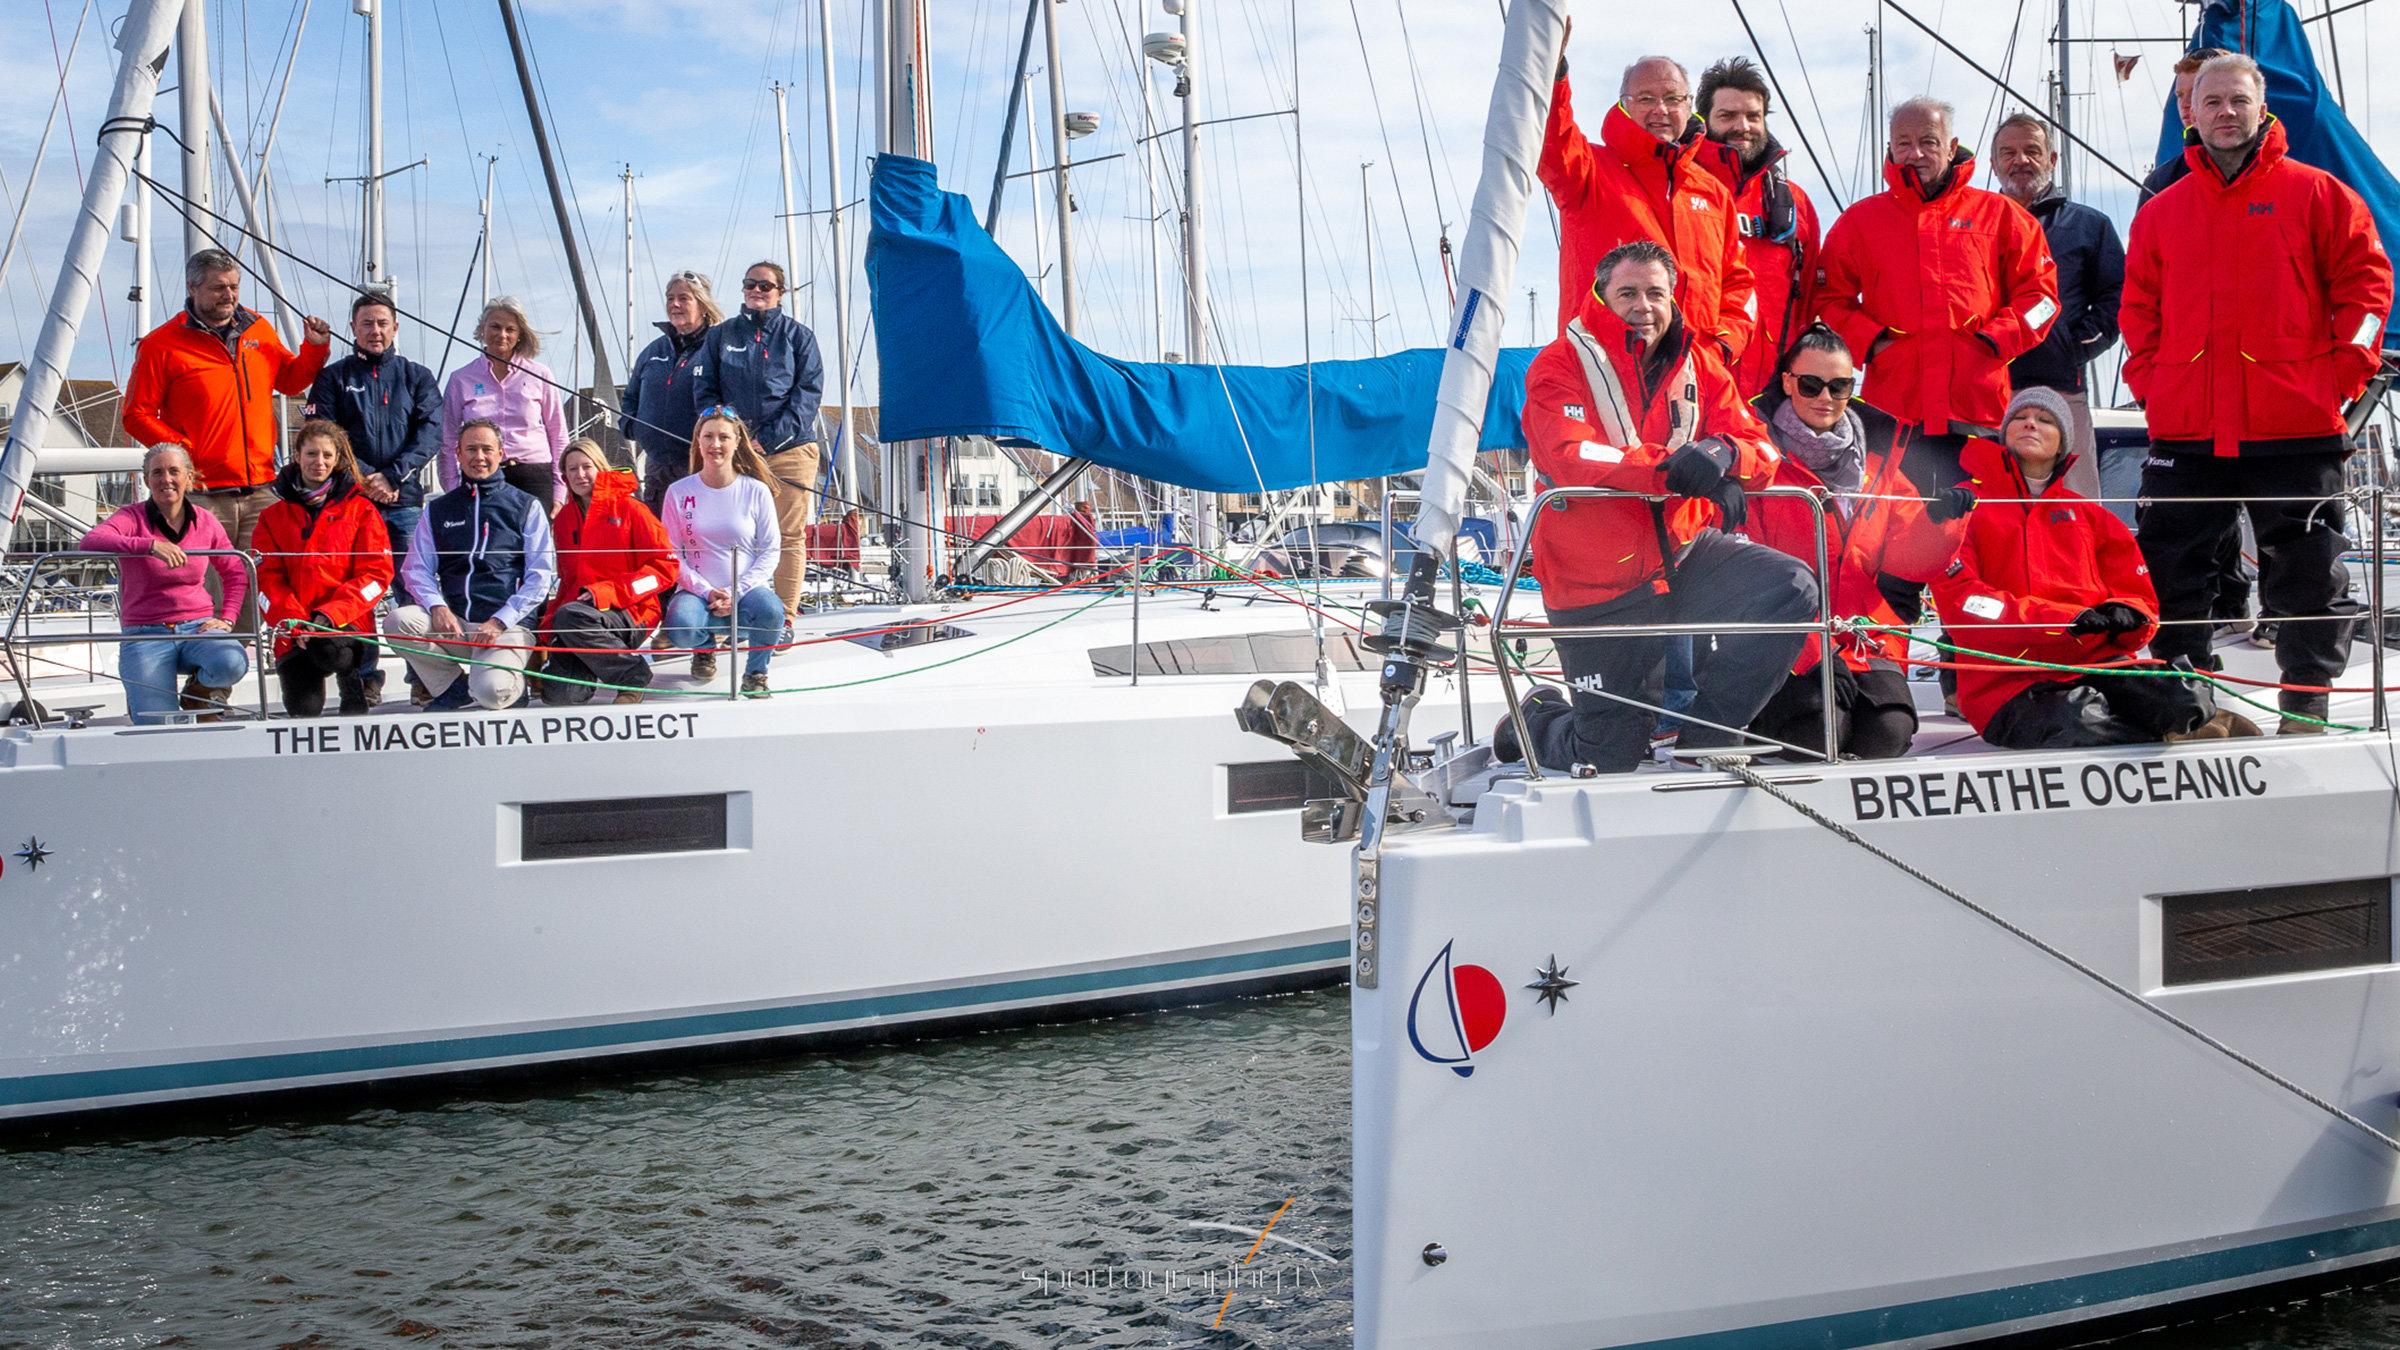 Magenta Project Sunsail 41.0 Yacht